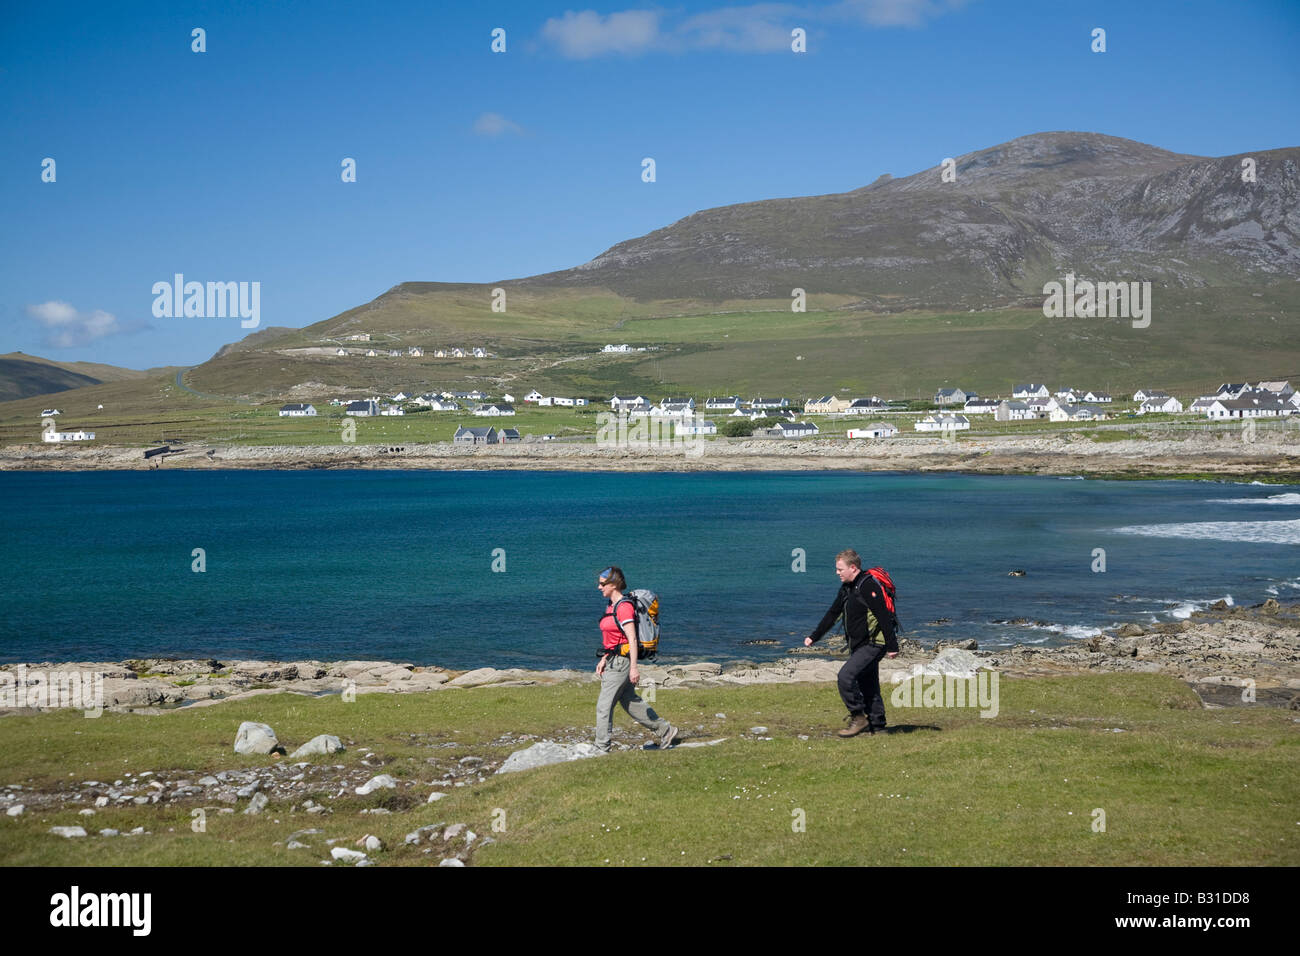 Walkers above Dooagh Bay, Achill Island, County Mayo, Ireland. - Stock Image